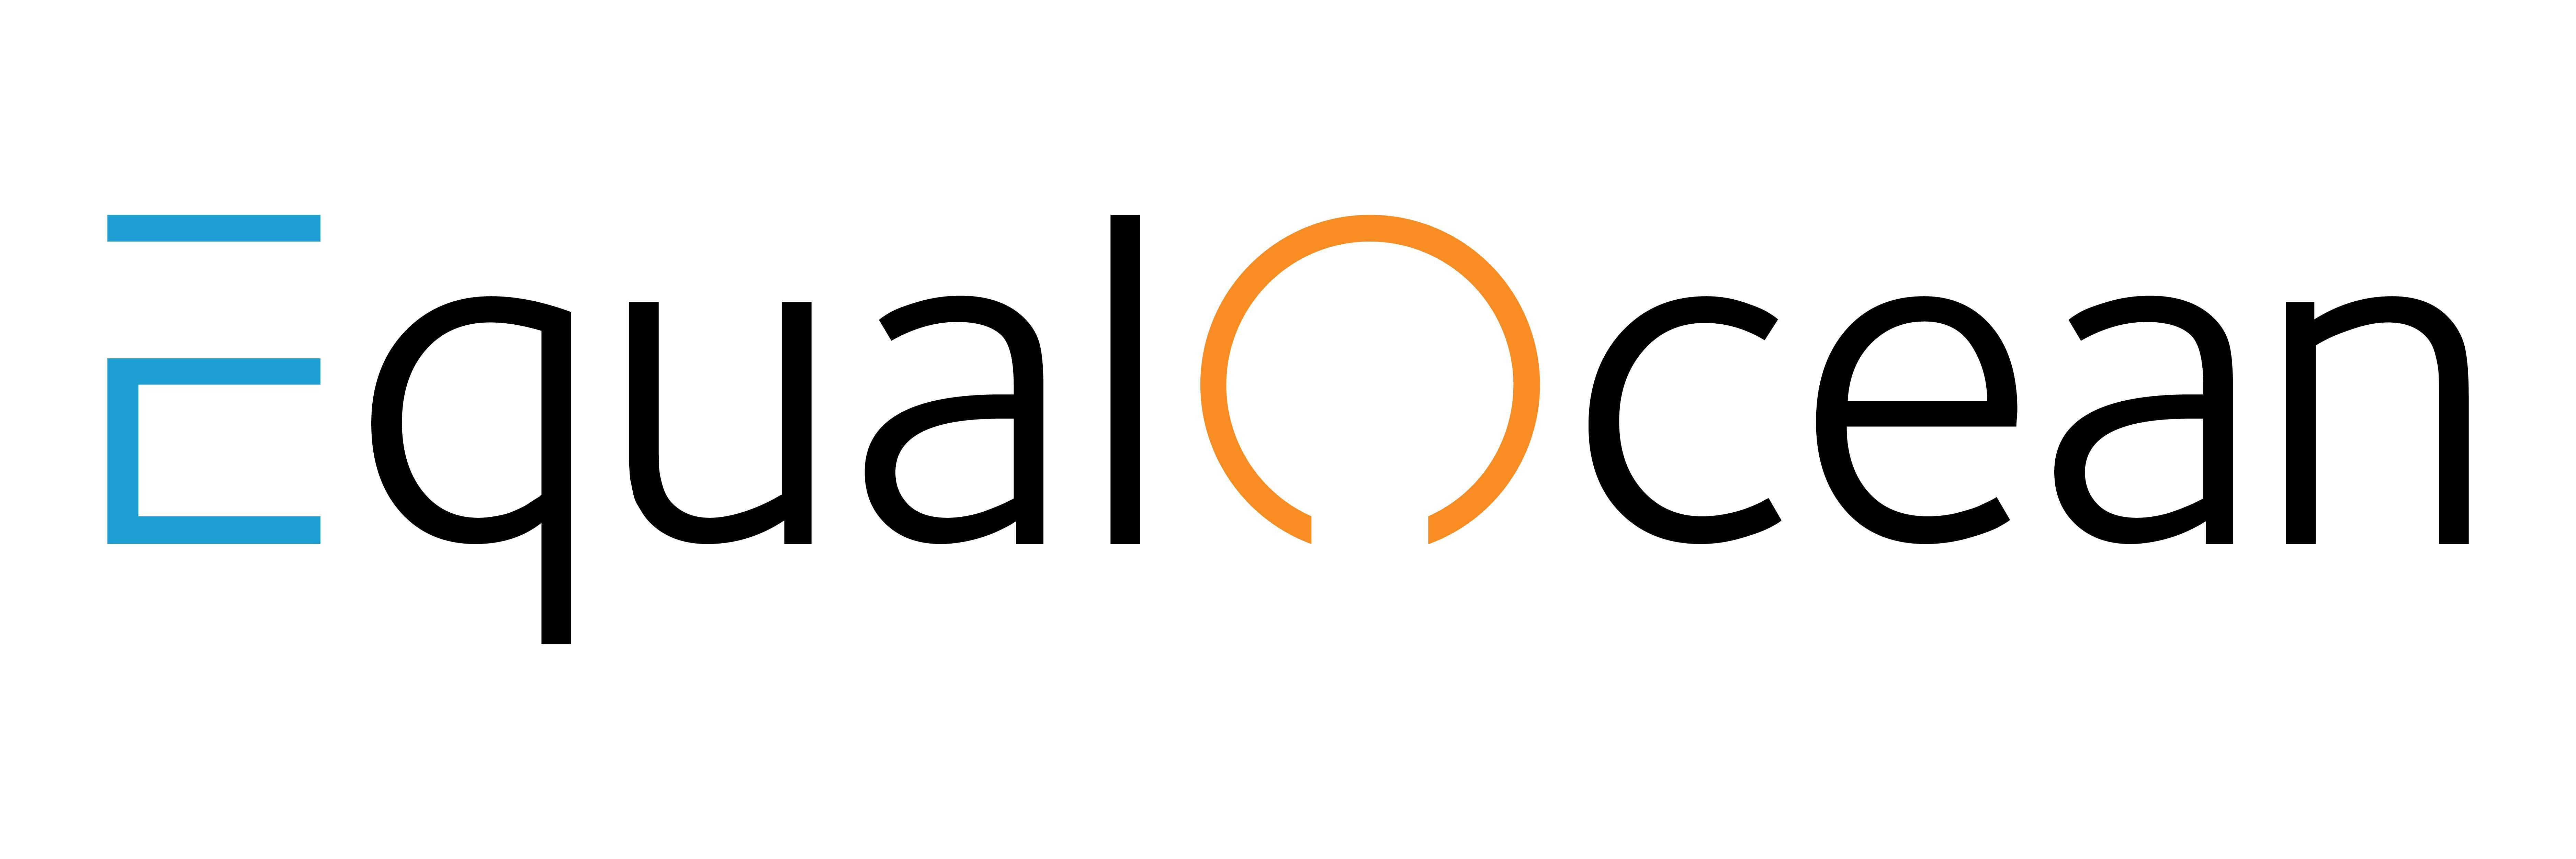 ca88唯一官方网站公司